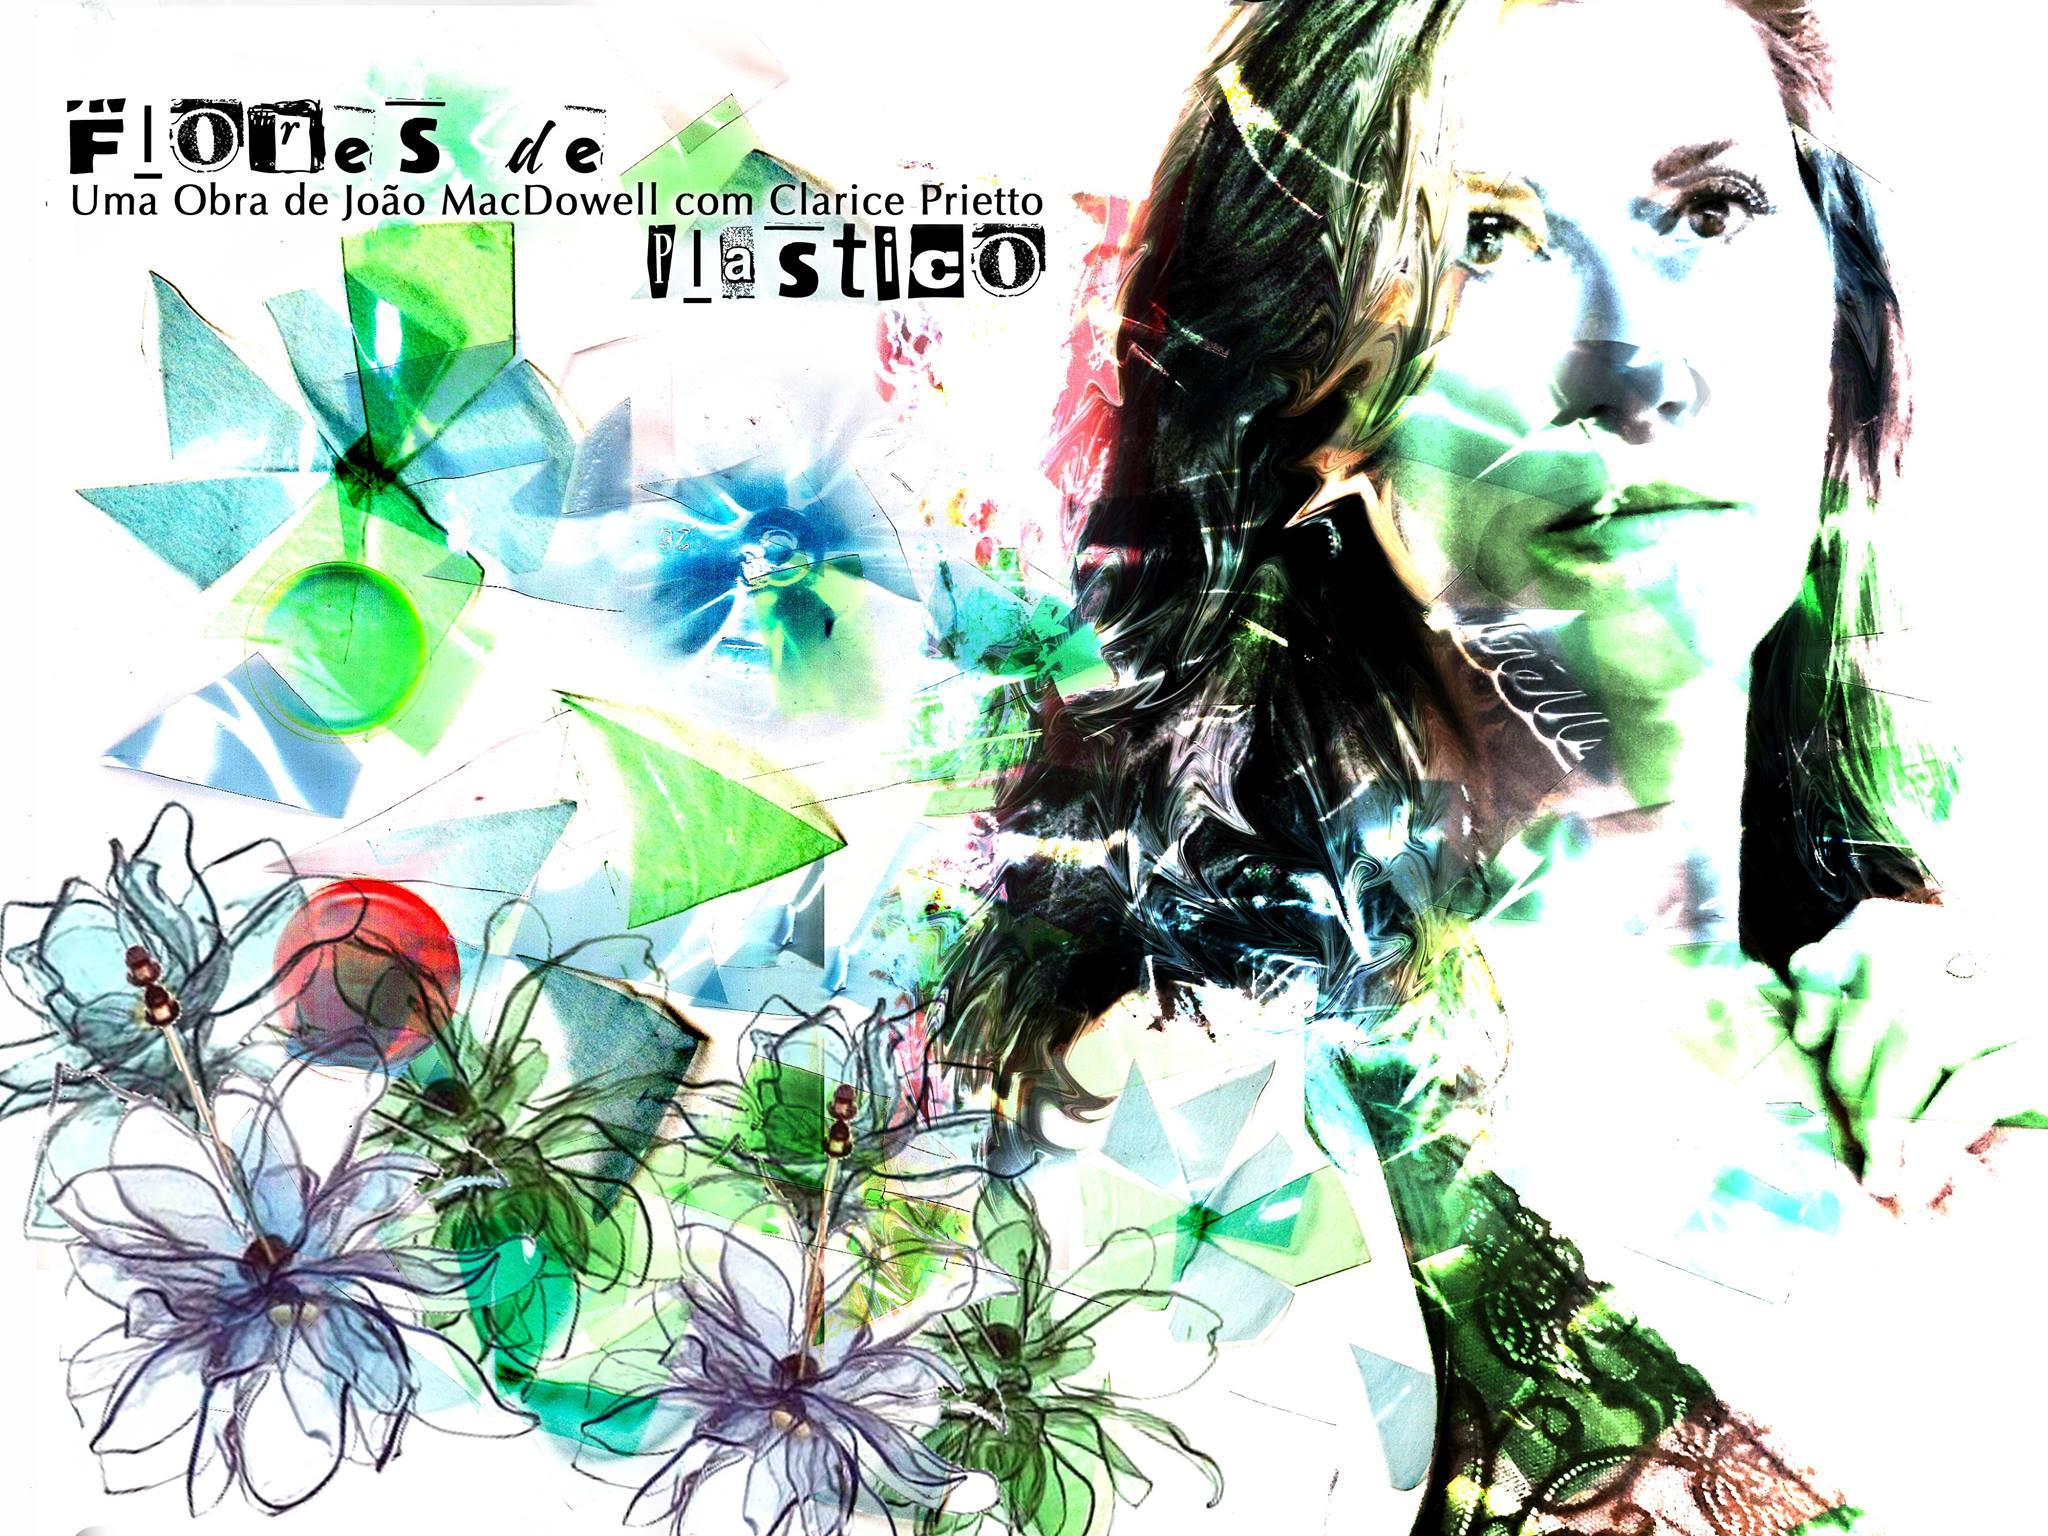 Flores de Plastico - estrelando Clarice Prietto